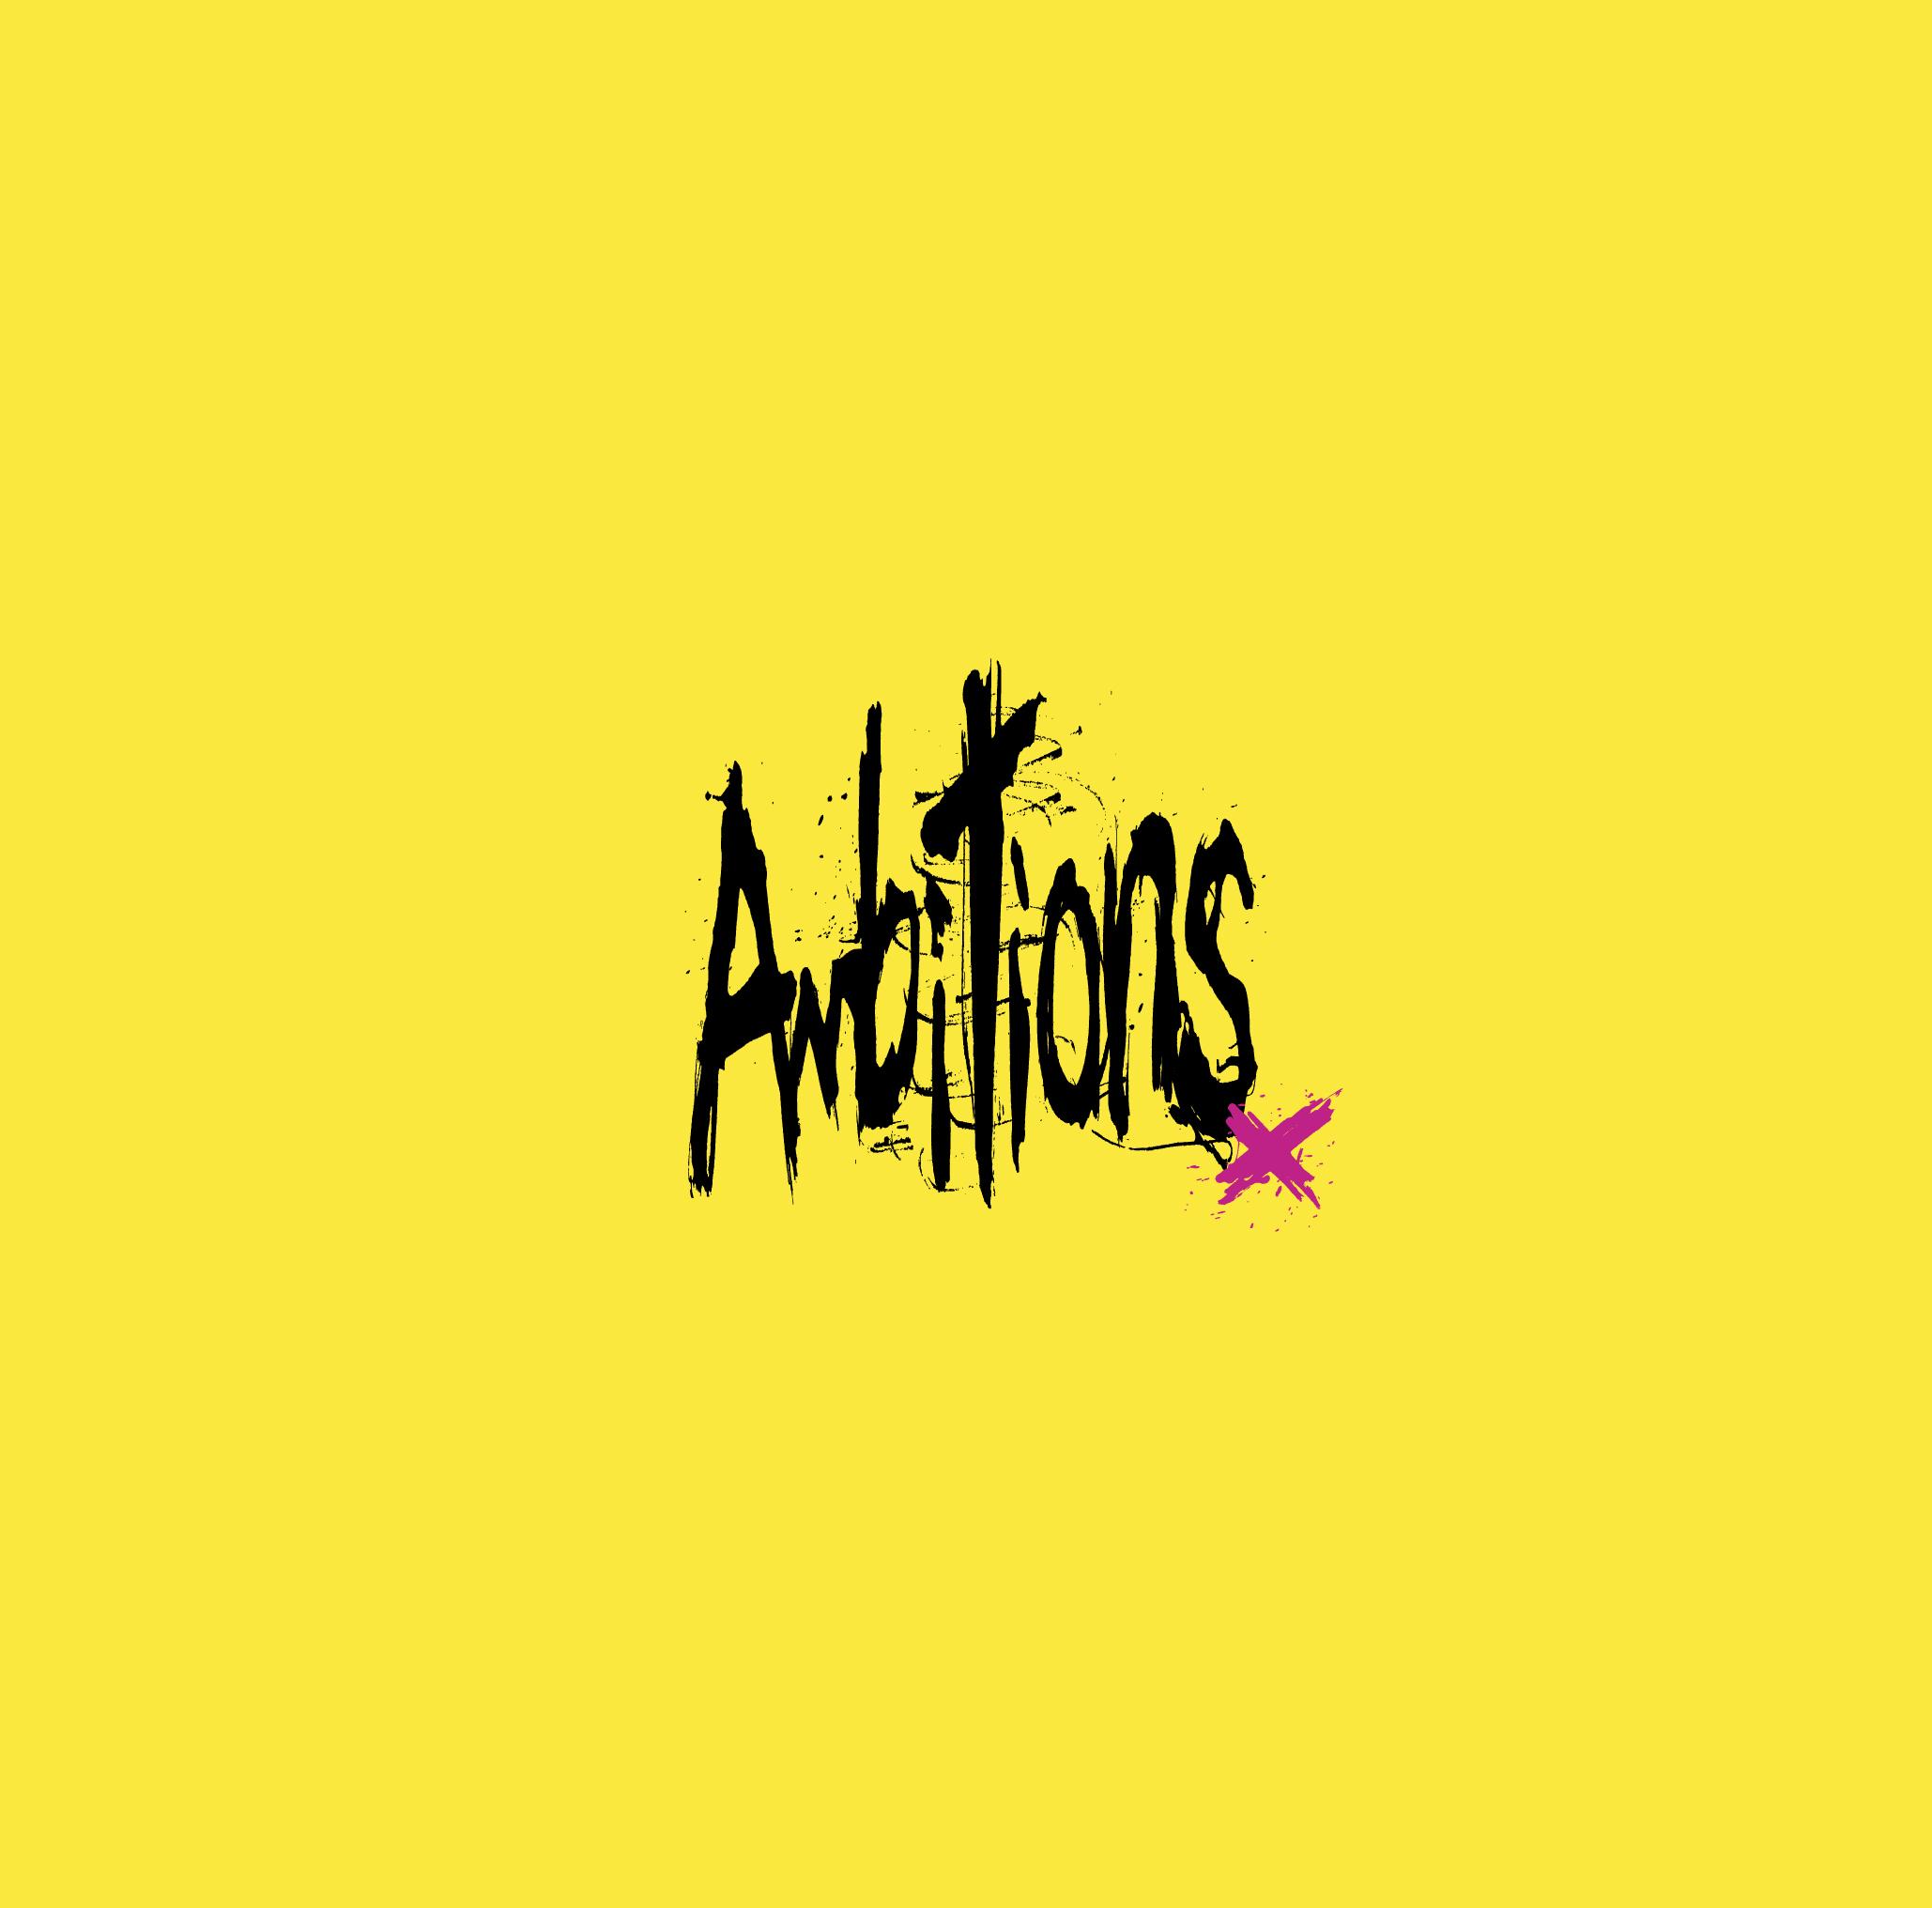 ONE OK ROCK (ワンオクロック) 8thアルバム『Ambitions (アンビションズ)』(2017年1月11日発売) 高画質ジャケ写